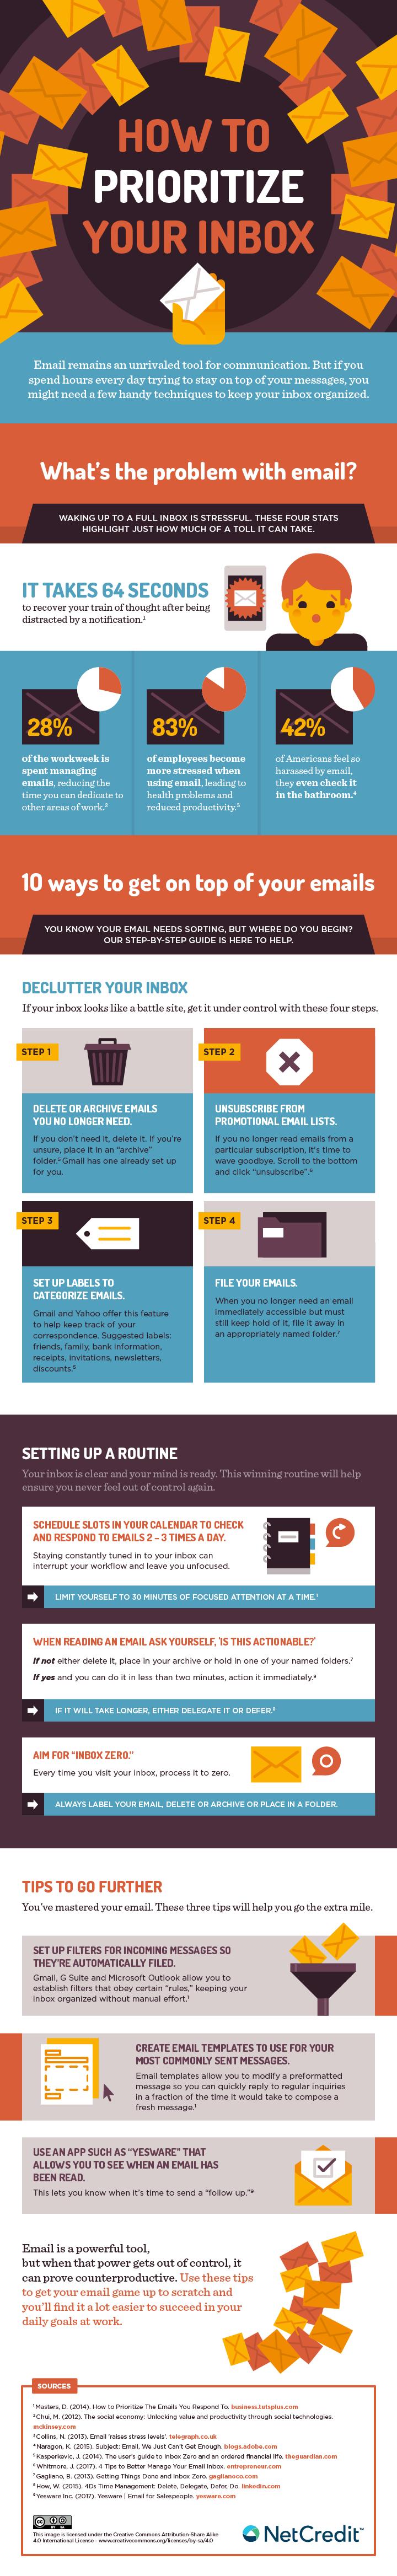 Prioritise your inbox